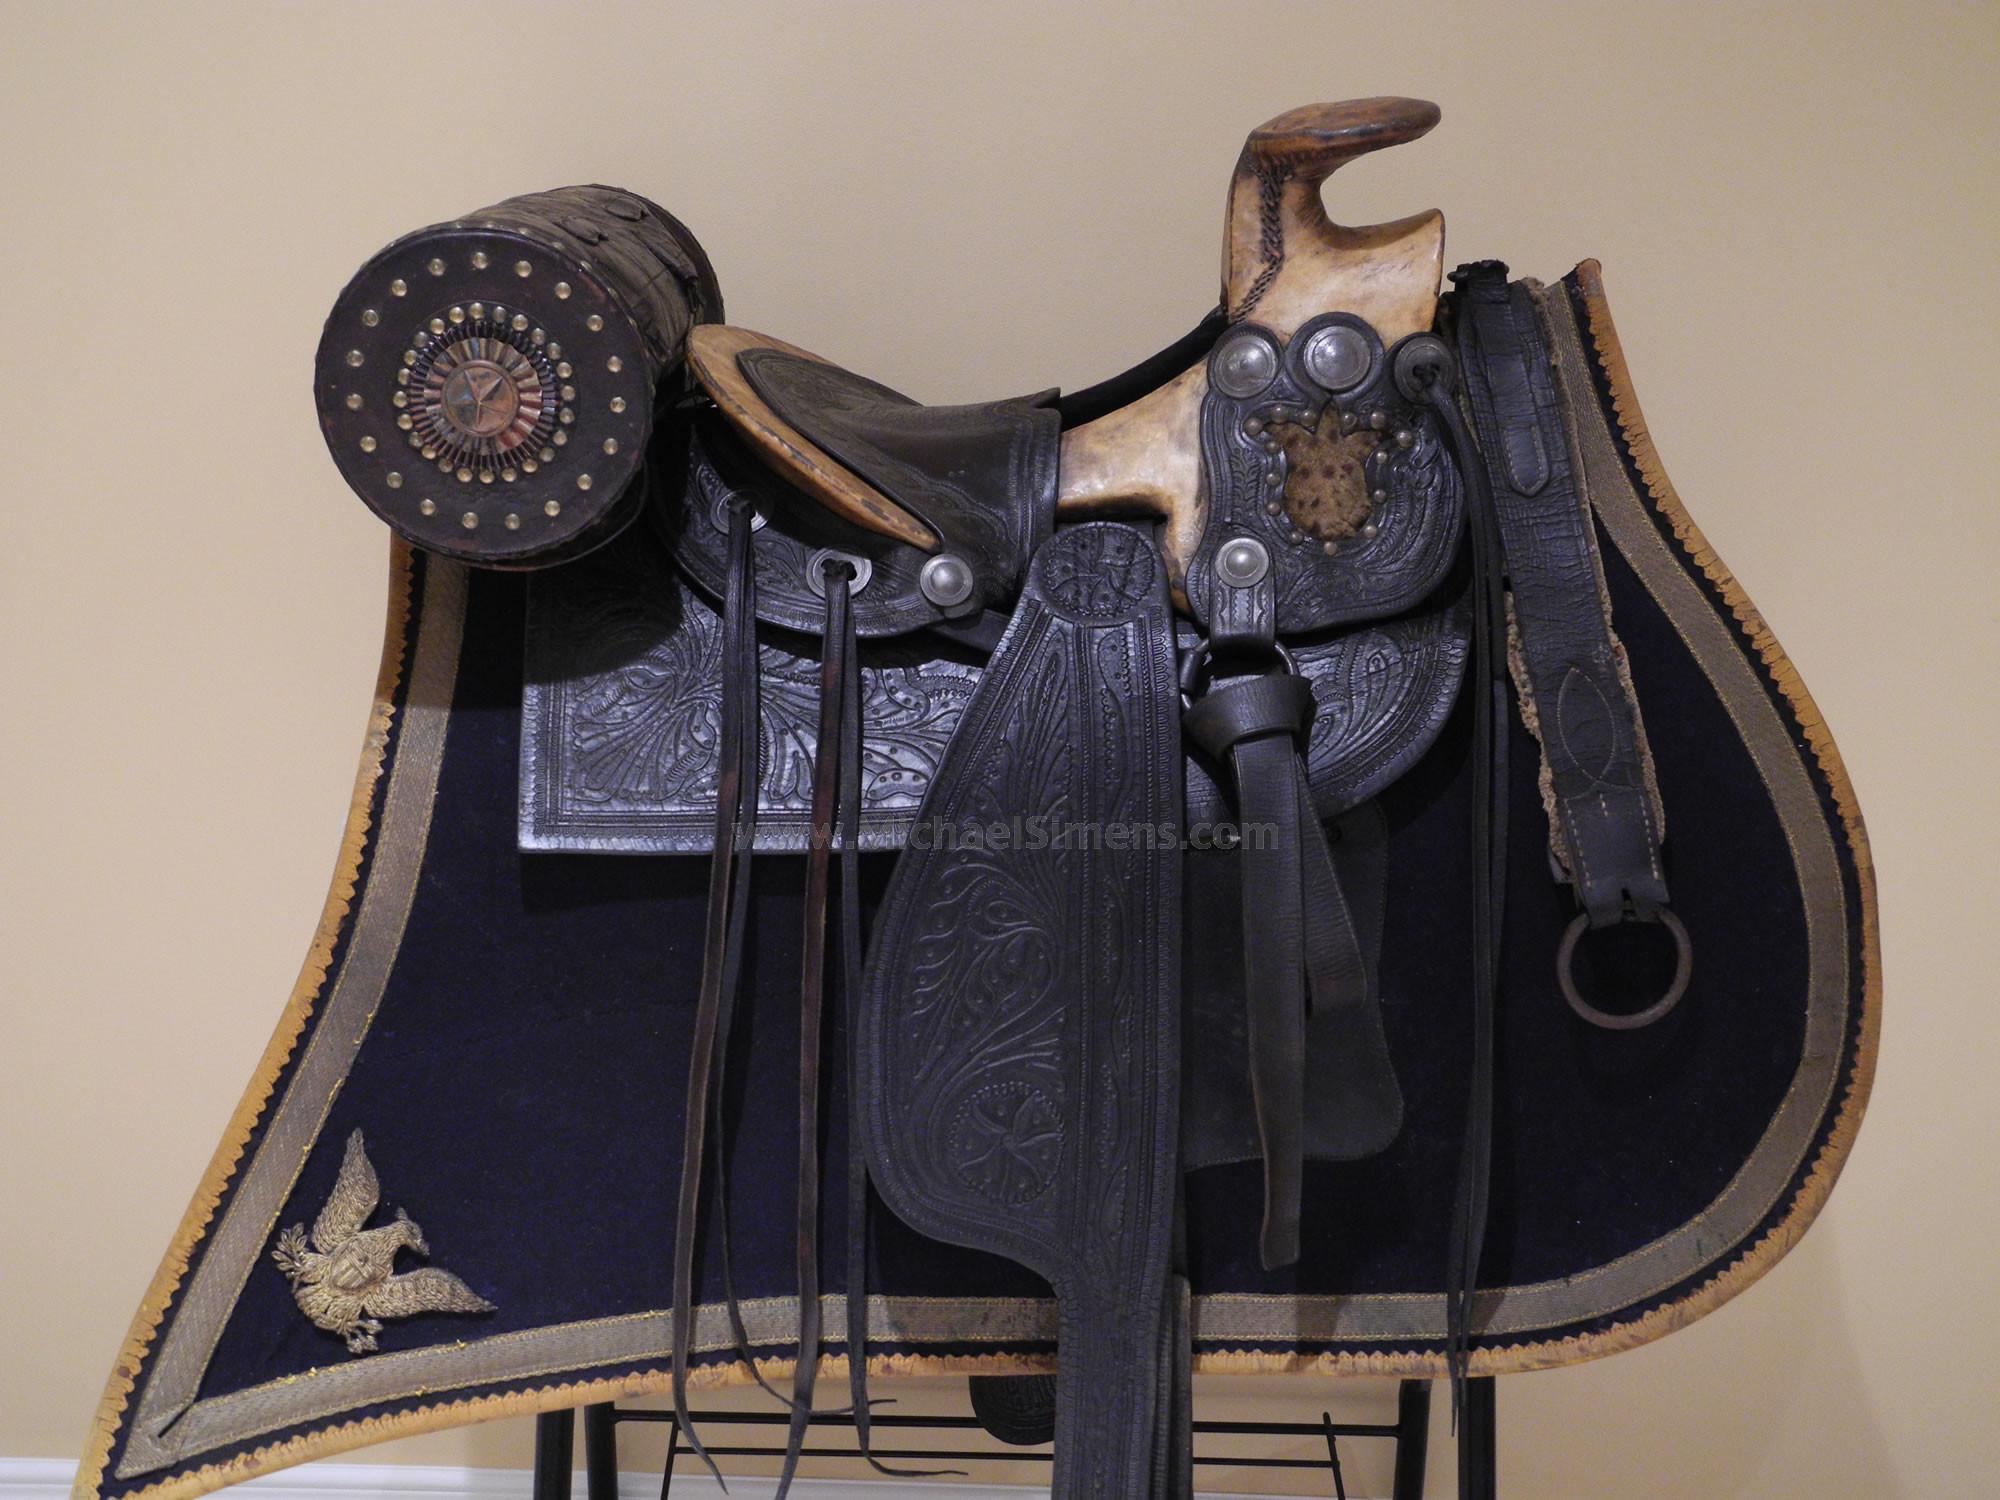 CIVIL WAR OFFICER'S SADDLE, Confederate